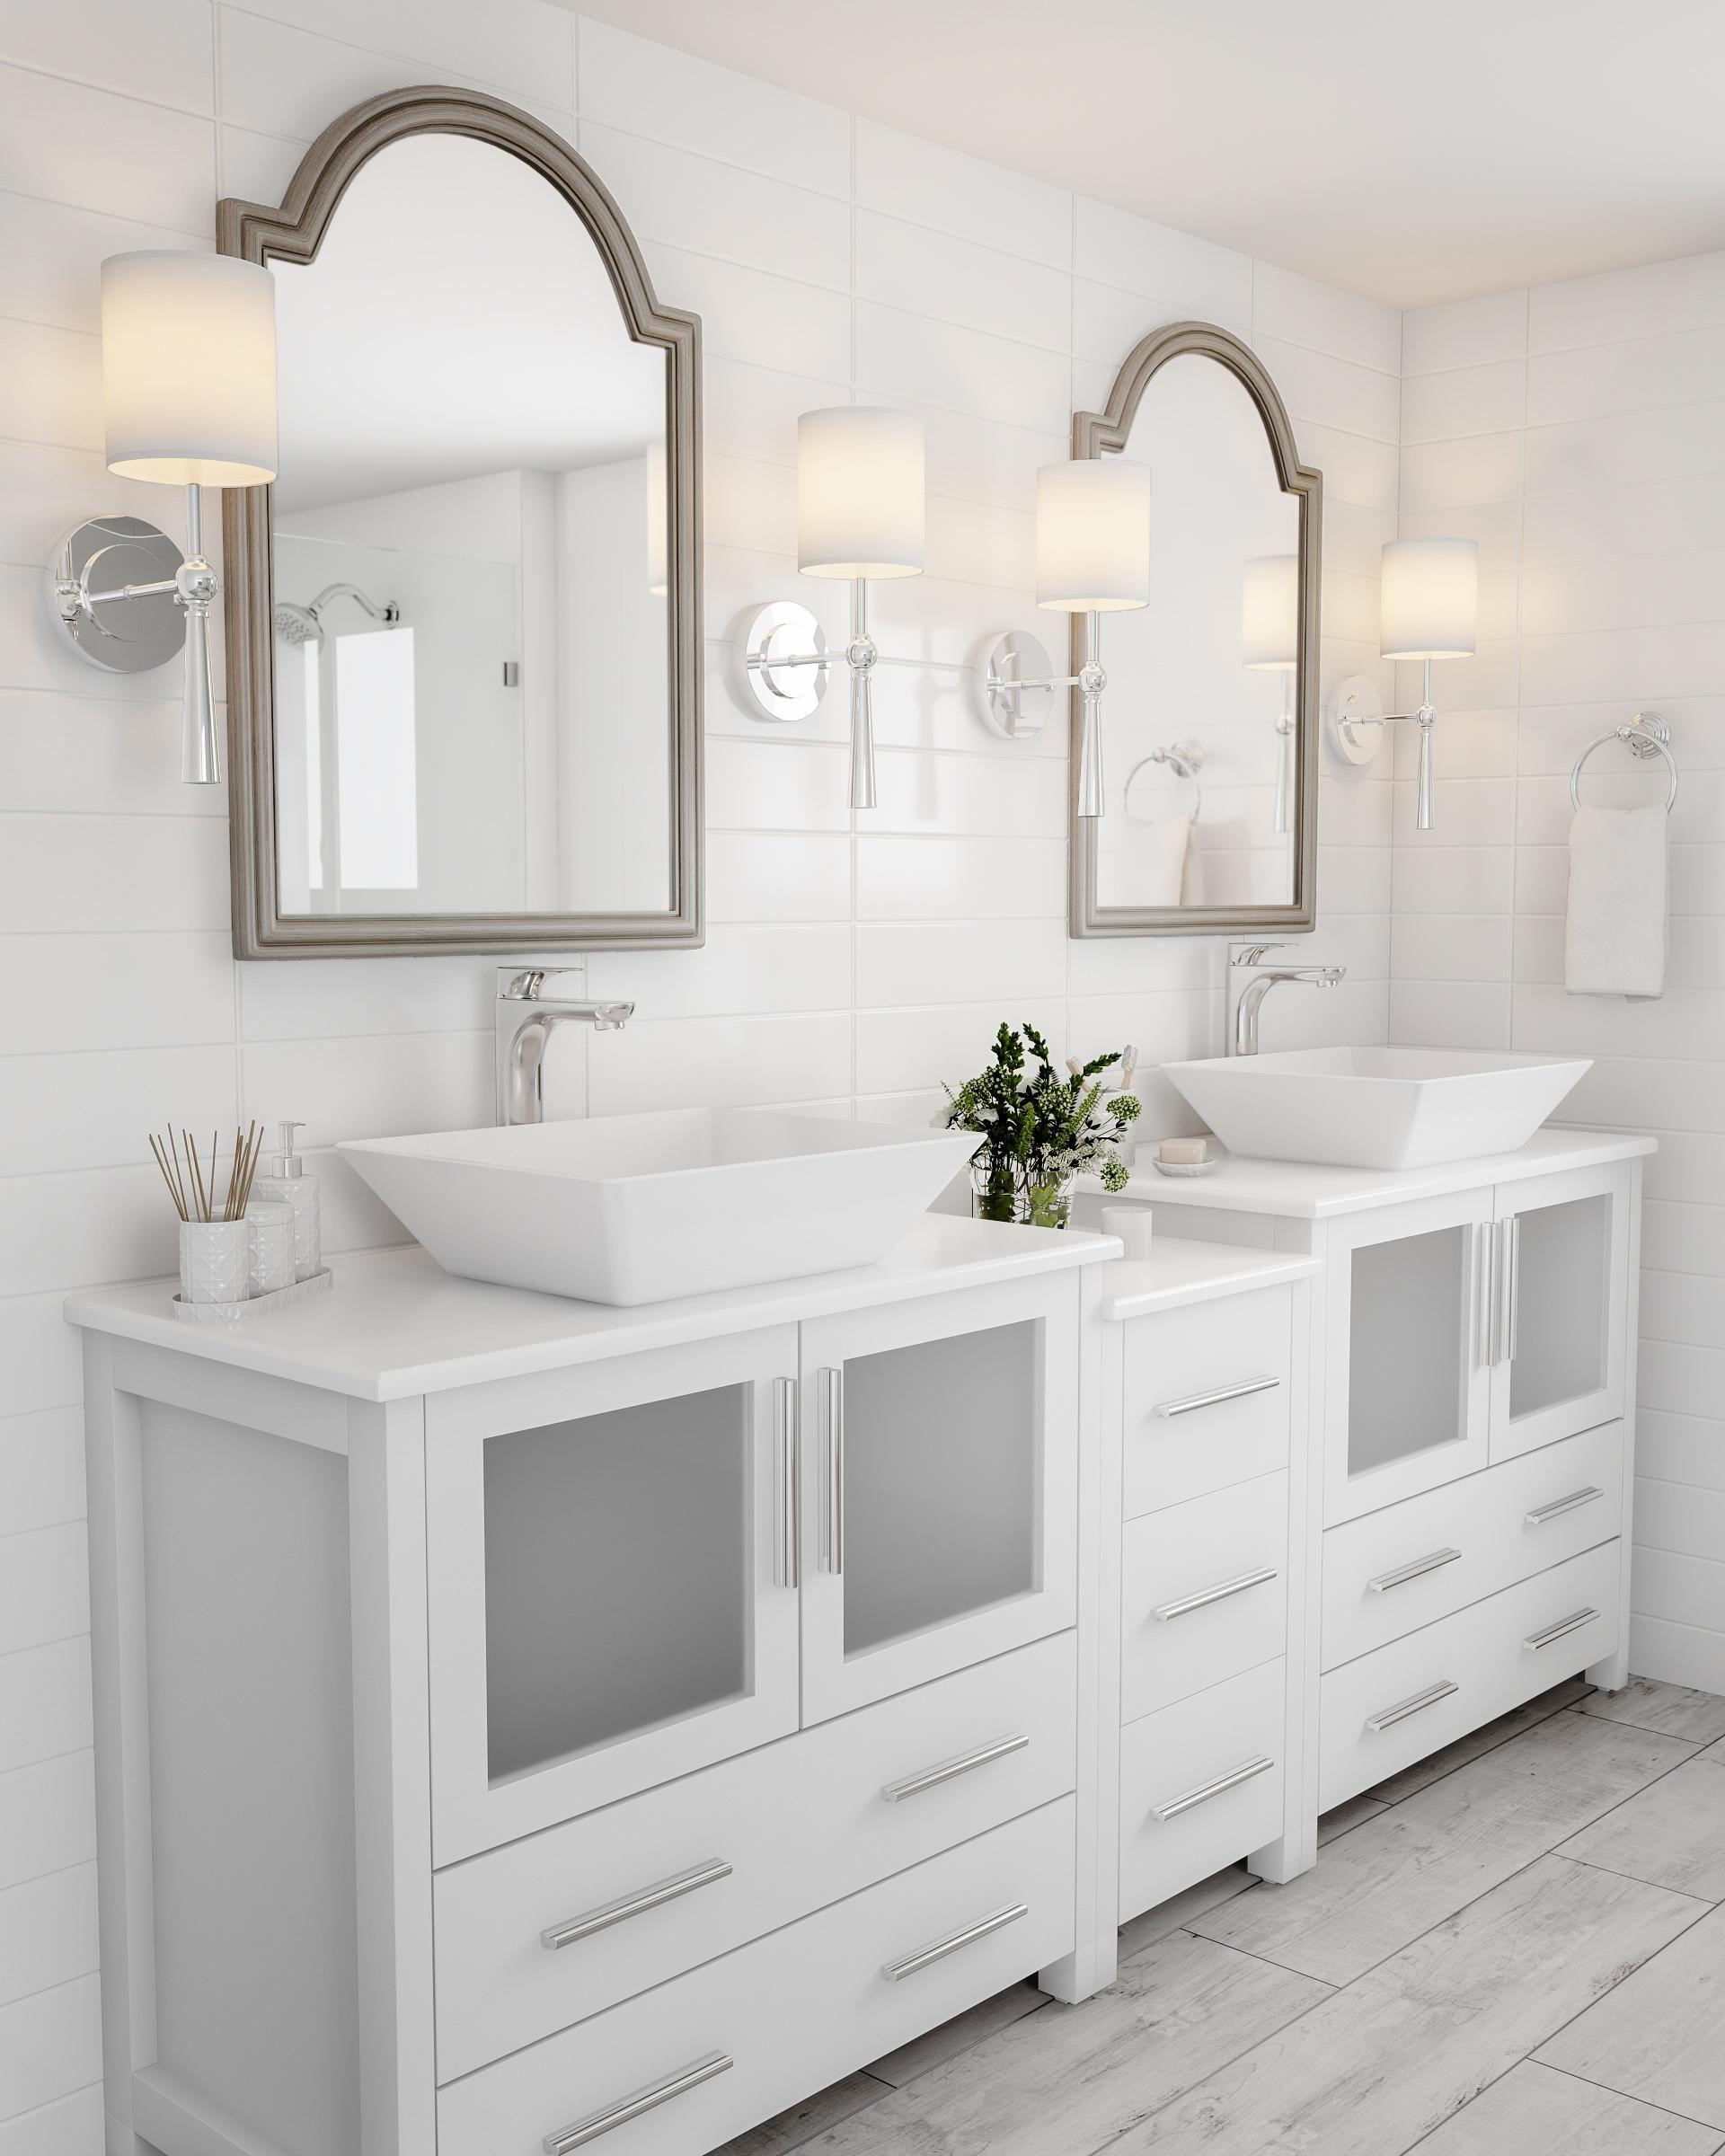 Bathroom Makeup Vanity Ideas Bathroom With Makeup Vanity Small